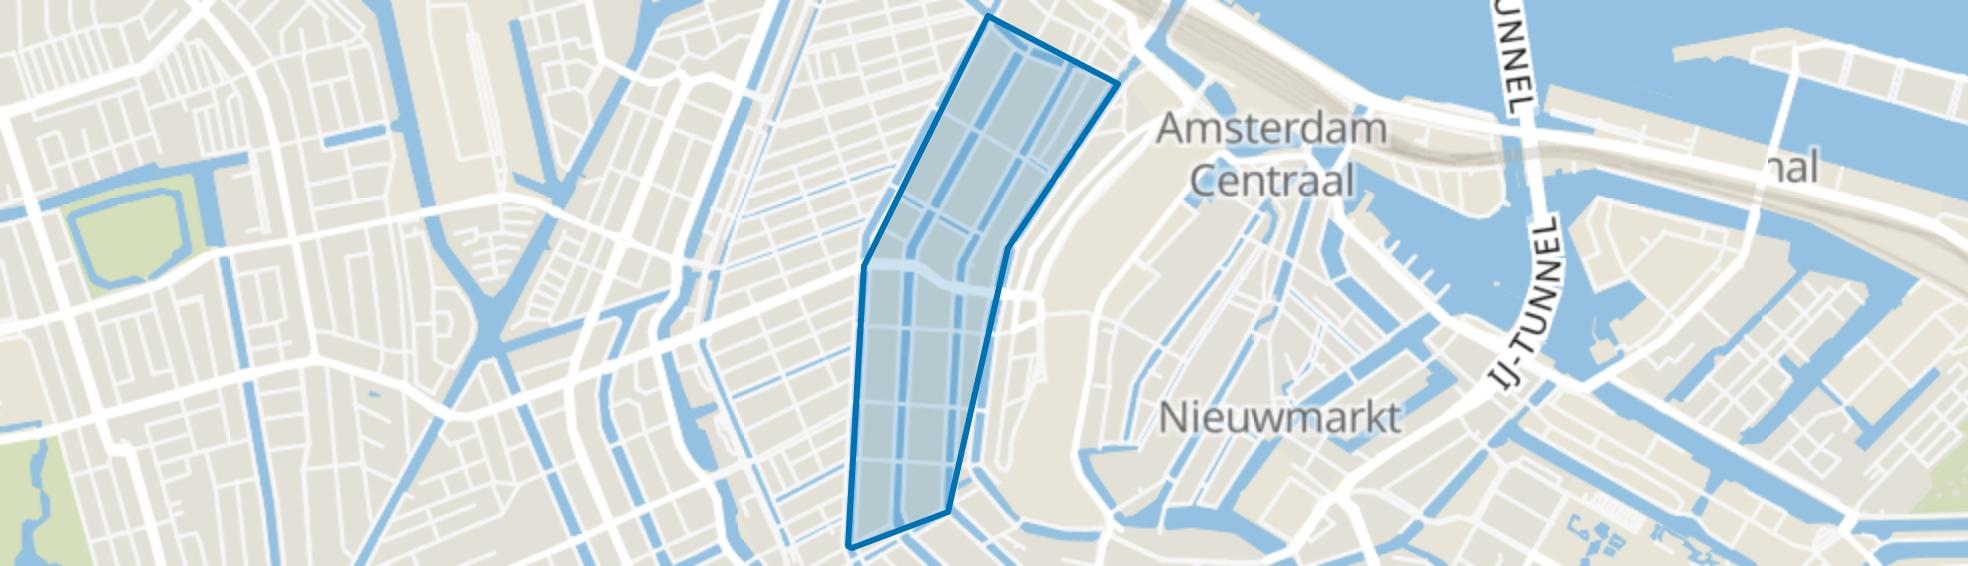 Grachtengordel-West, Amsterdam map